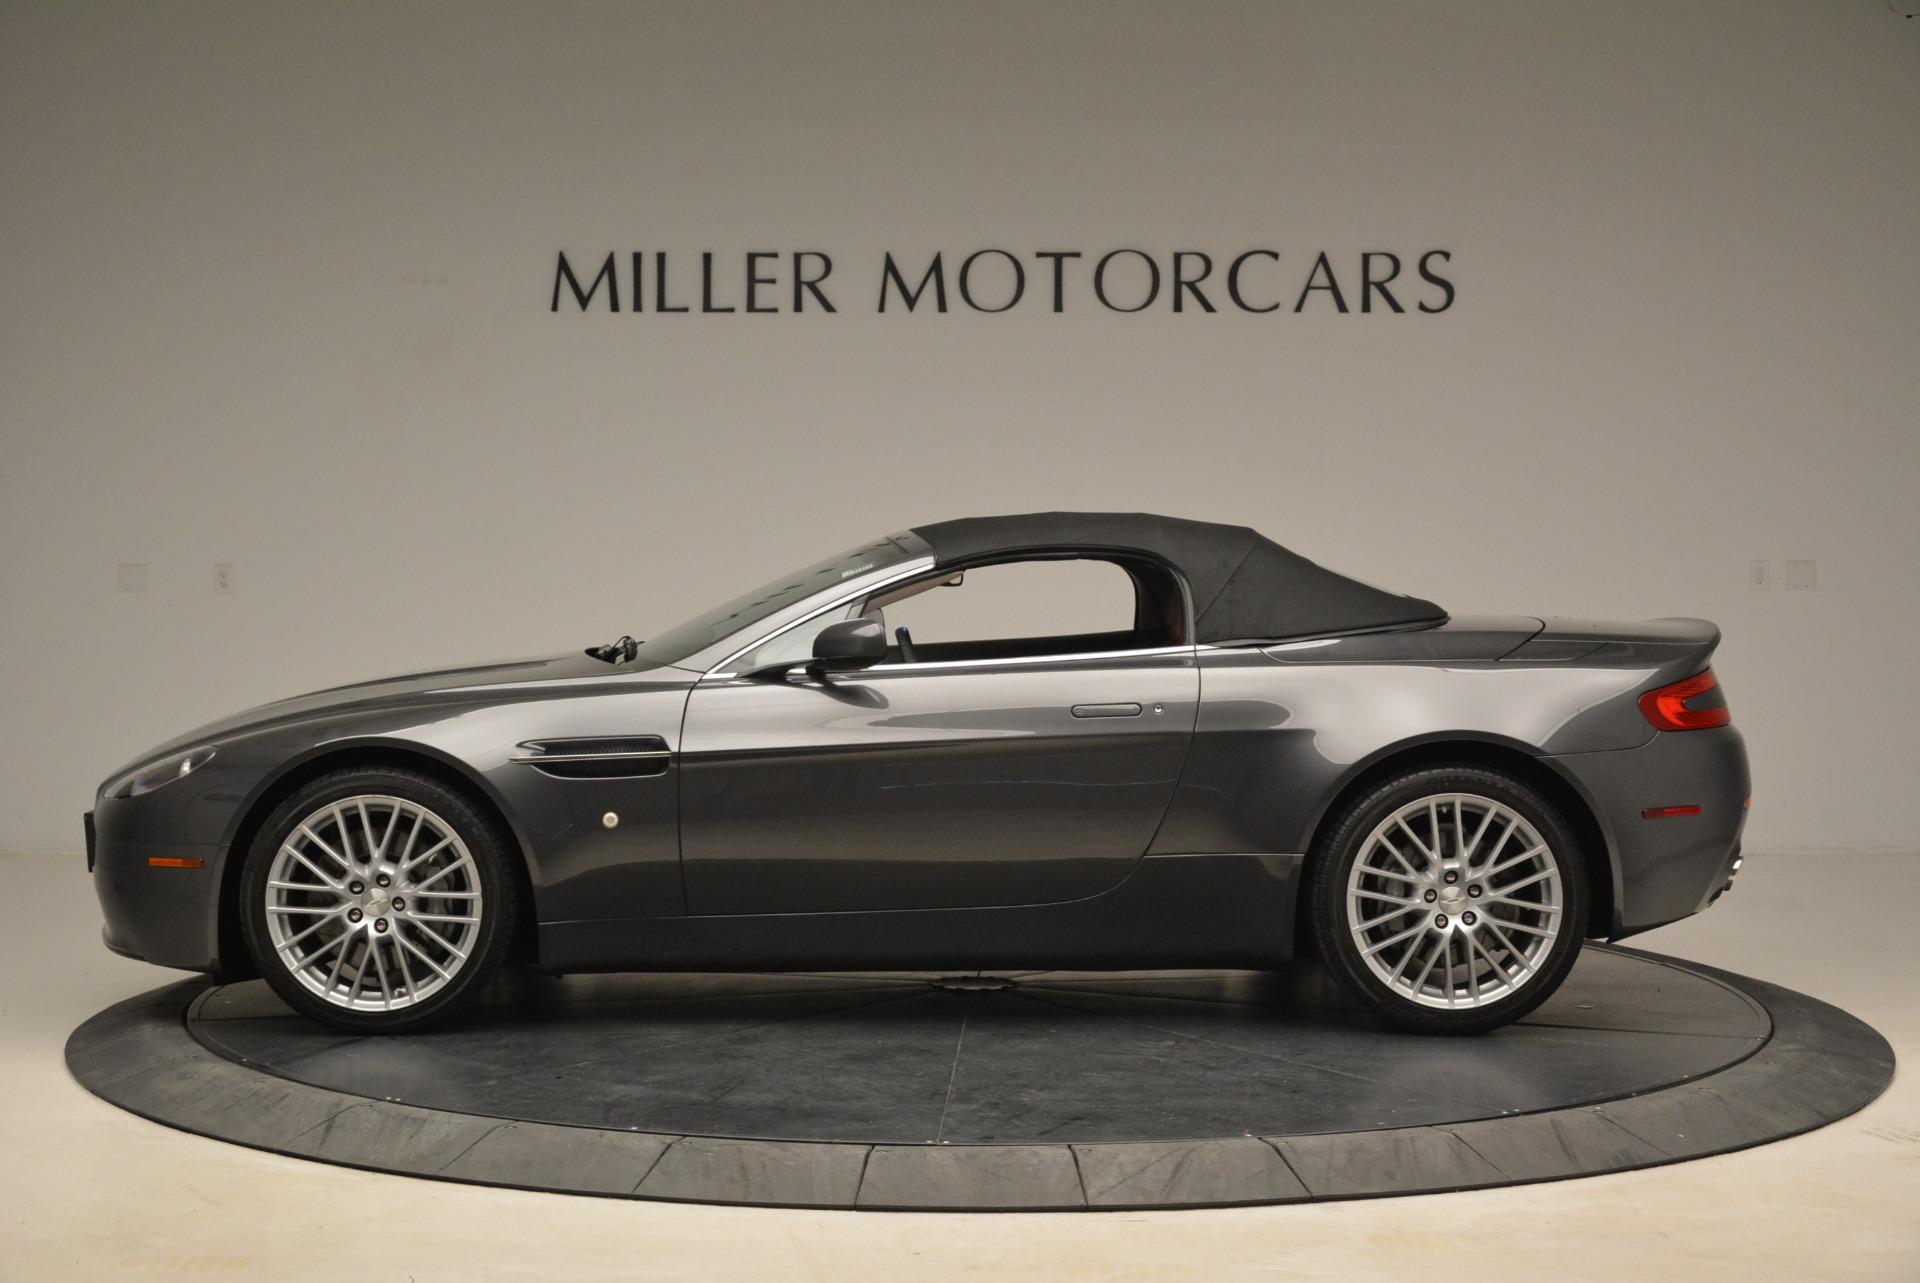 Used 2009 Aston Martin V8 Vantage Roadster For Sale In Westport, CT 2123_p15